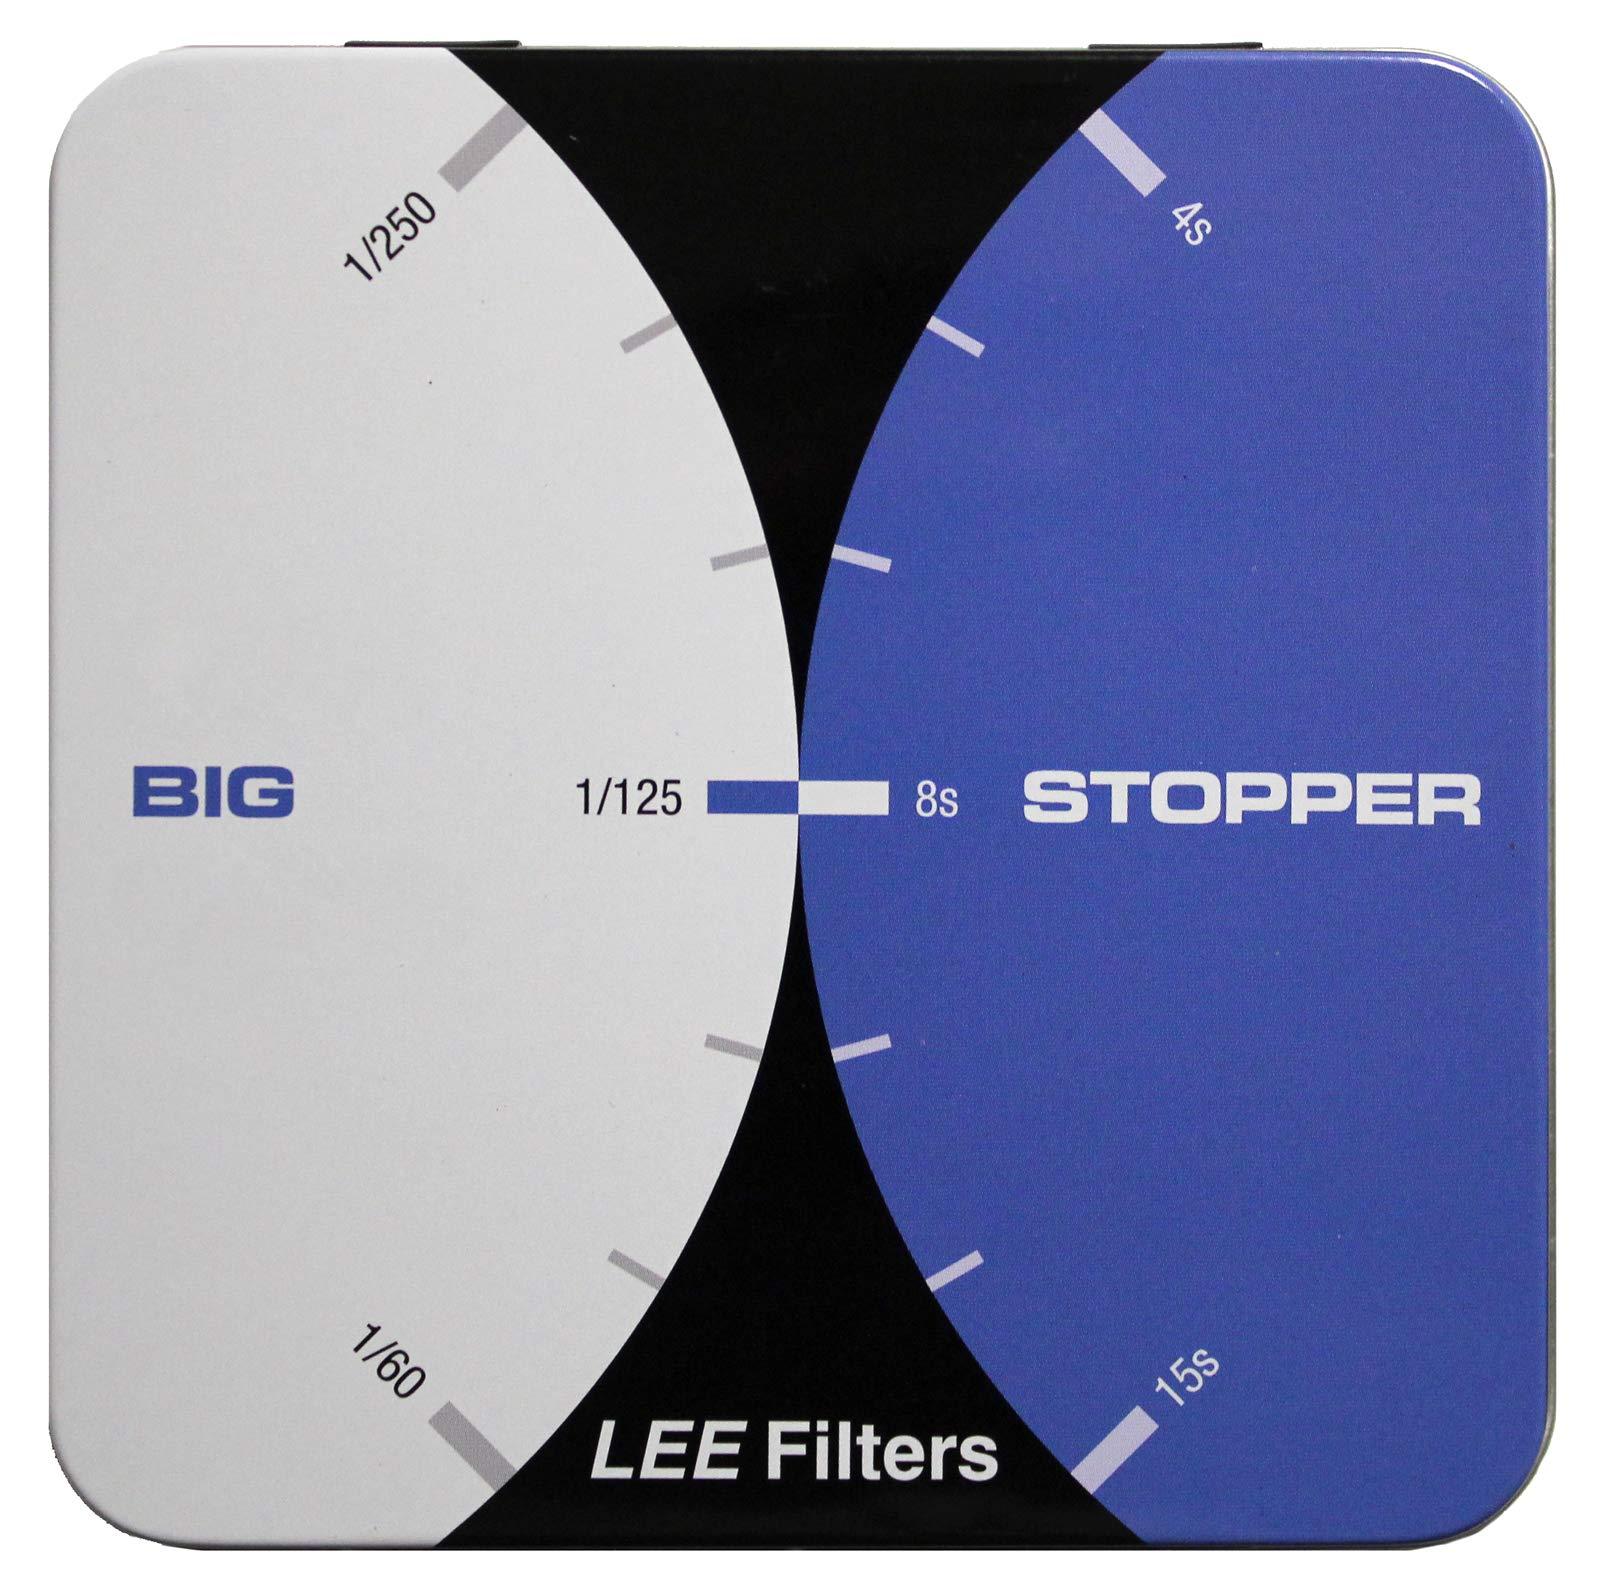 Lee Filters 100mm Big Stopper 3.0 Neutral Density Filter (10-stops) by Lee Filters